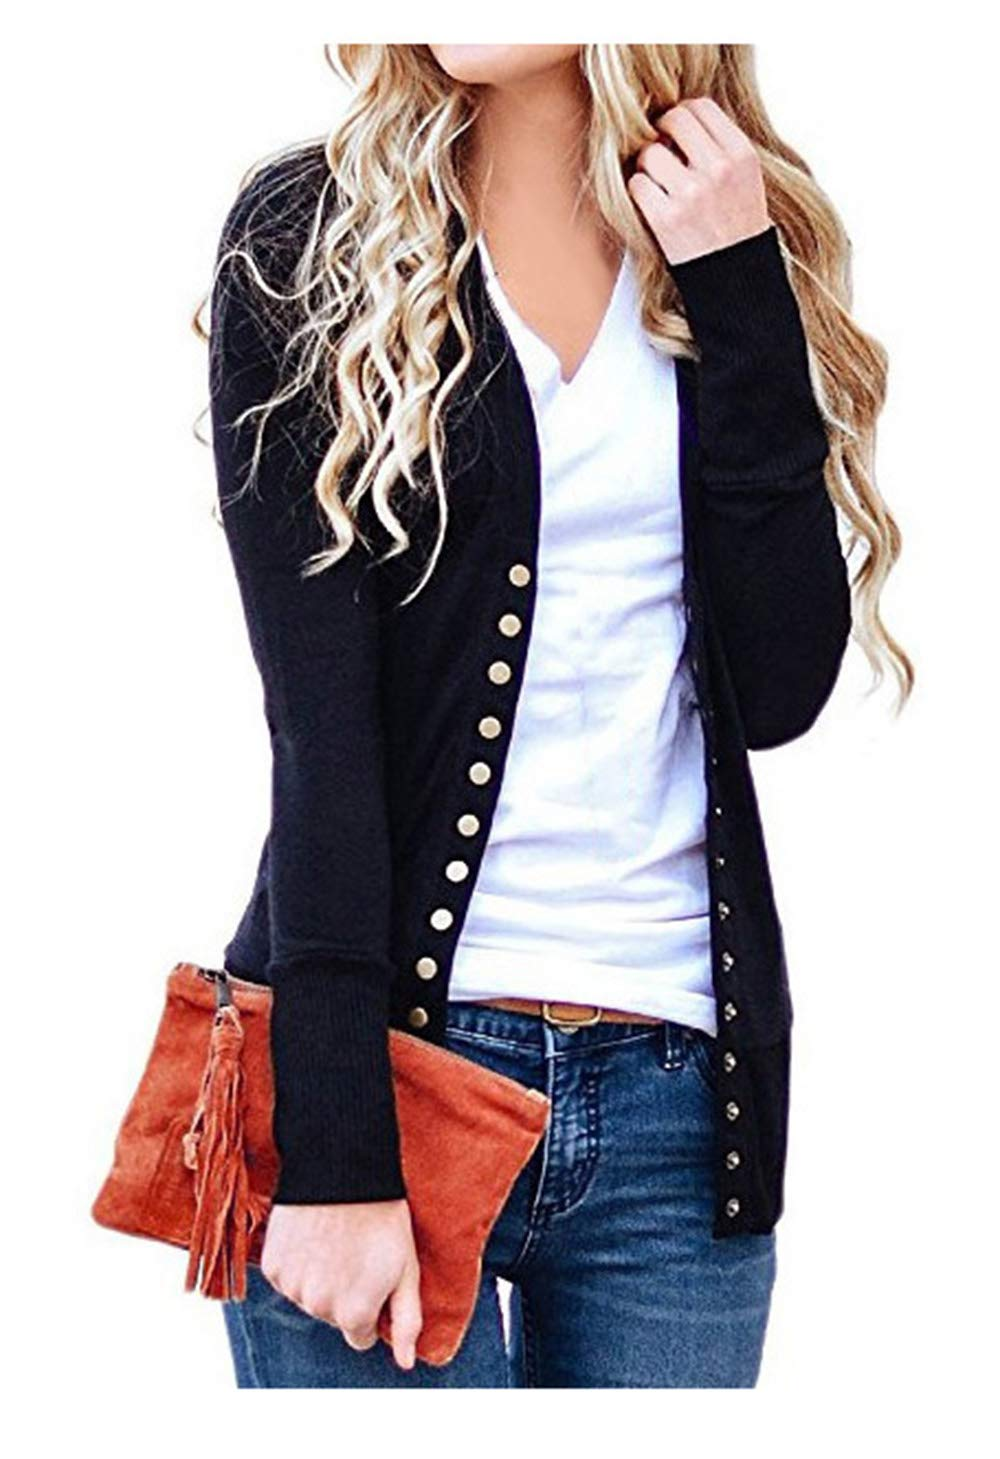 Finoceans Button Down Open Front Cardigans for Women Long Sleeve Tops Black 2XL